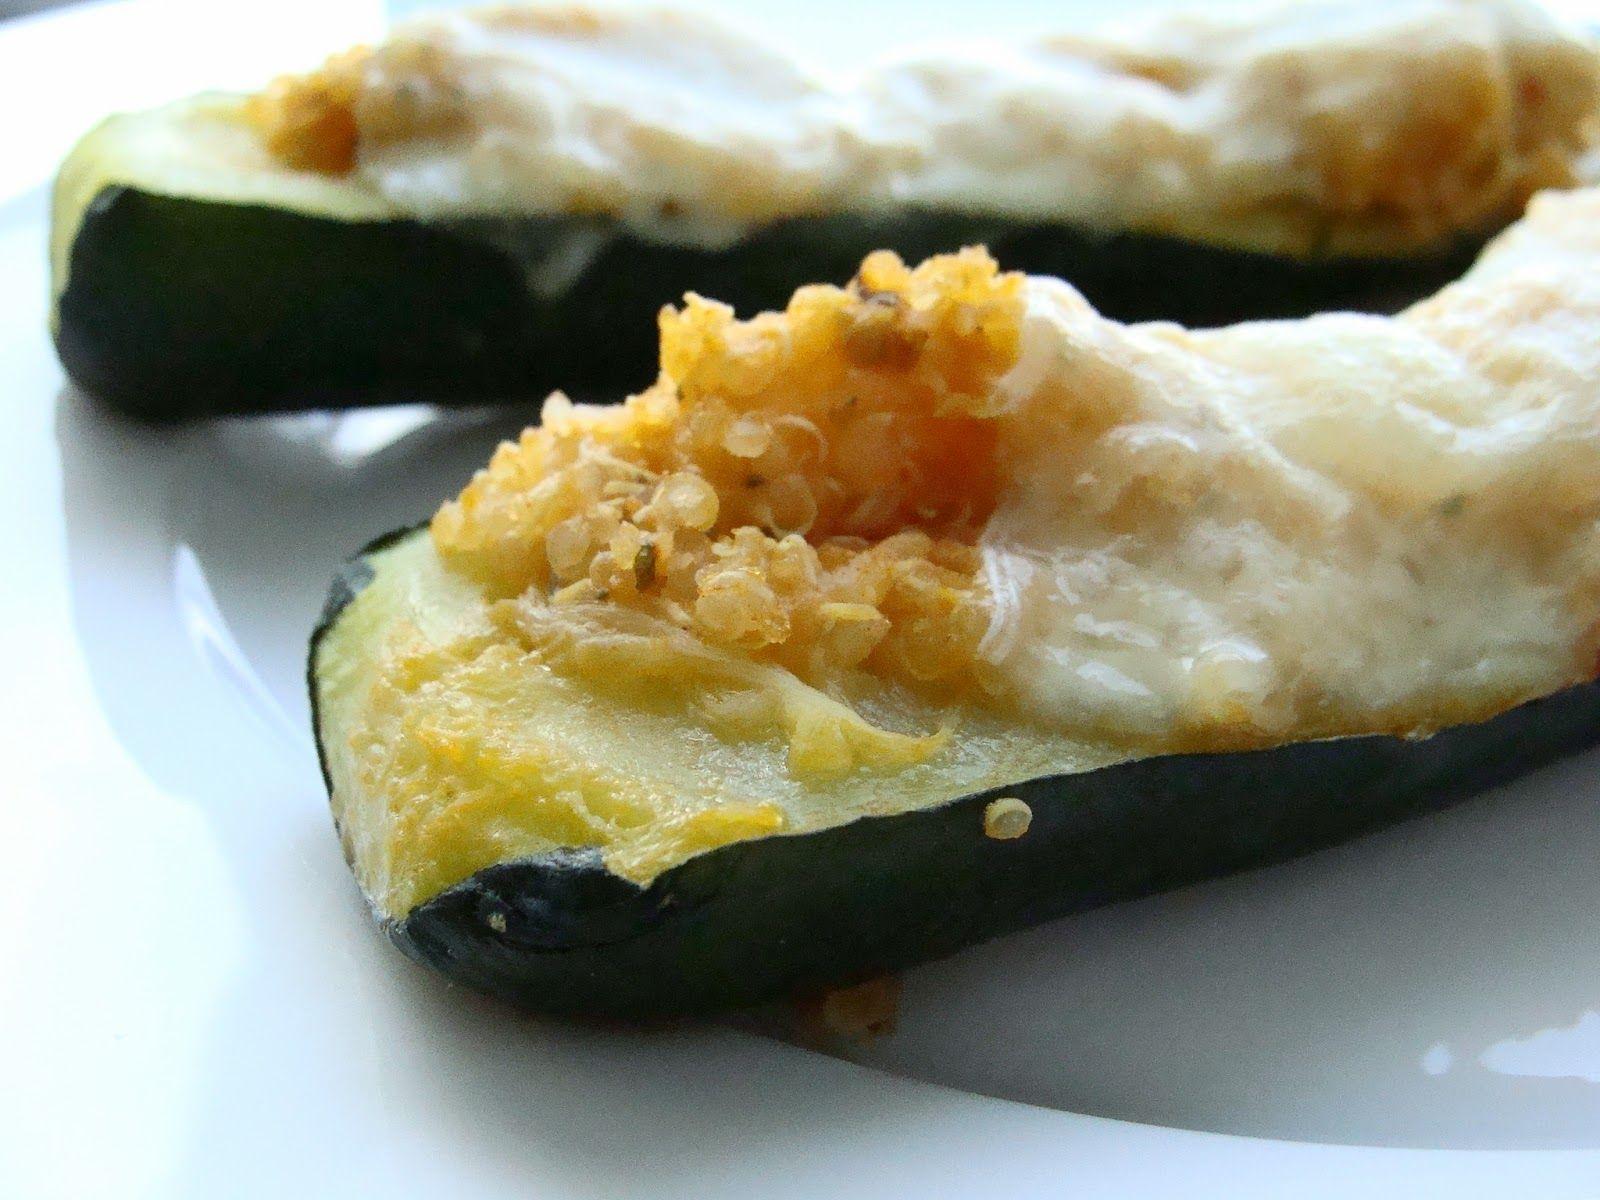 . For the Love of Food, Travel and Wine: Calabacín relleno de Quinoa, Tomate Frito, Pinenton de la Vera y Queso y Roules aux Figues